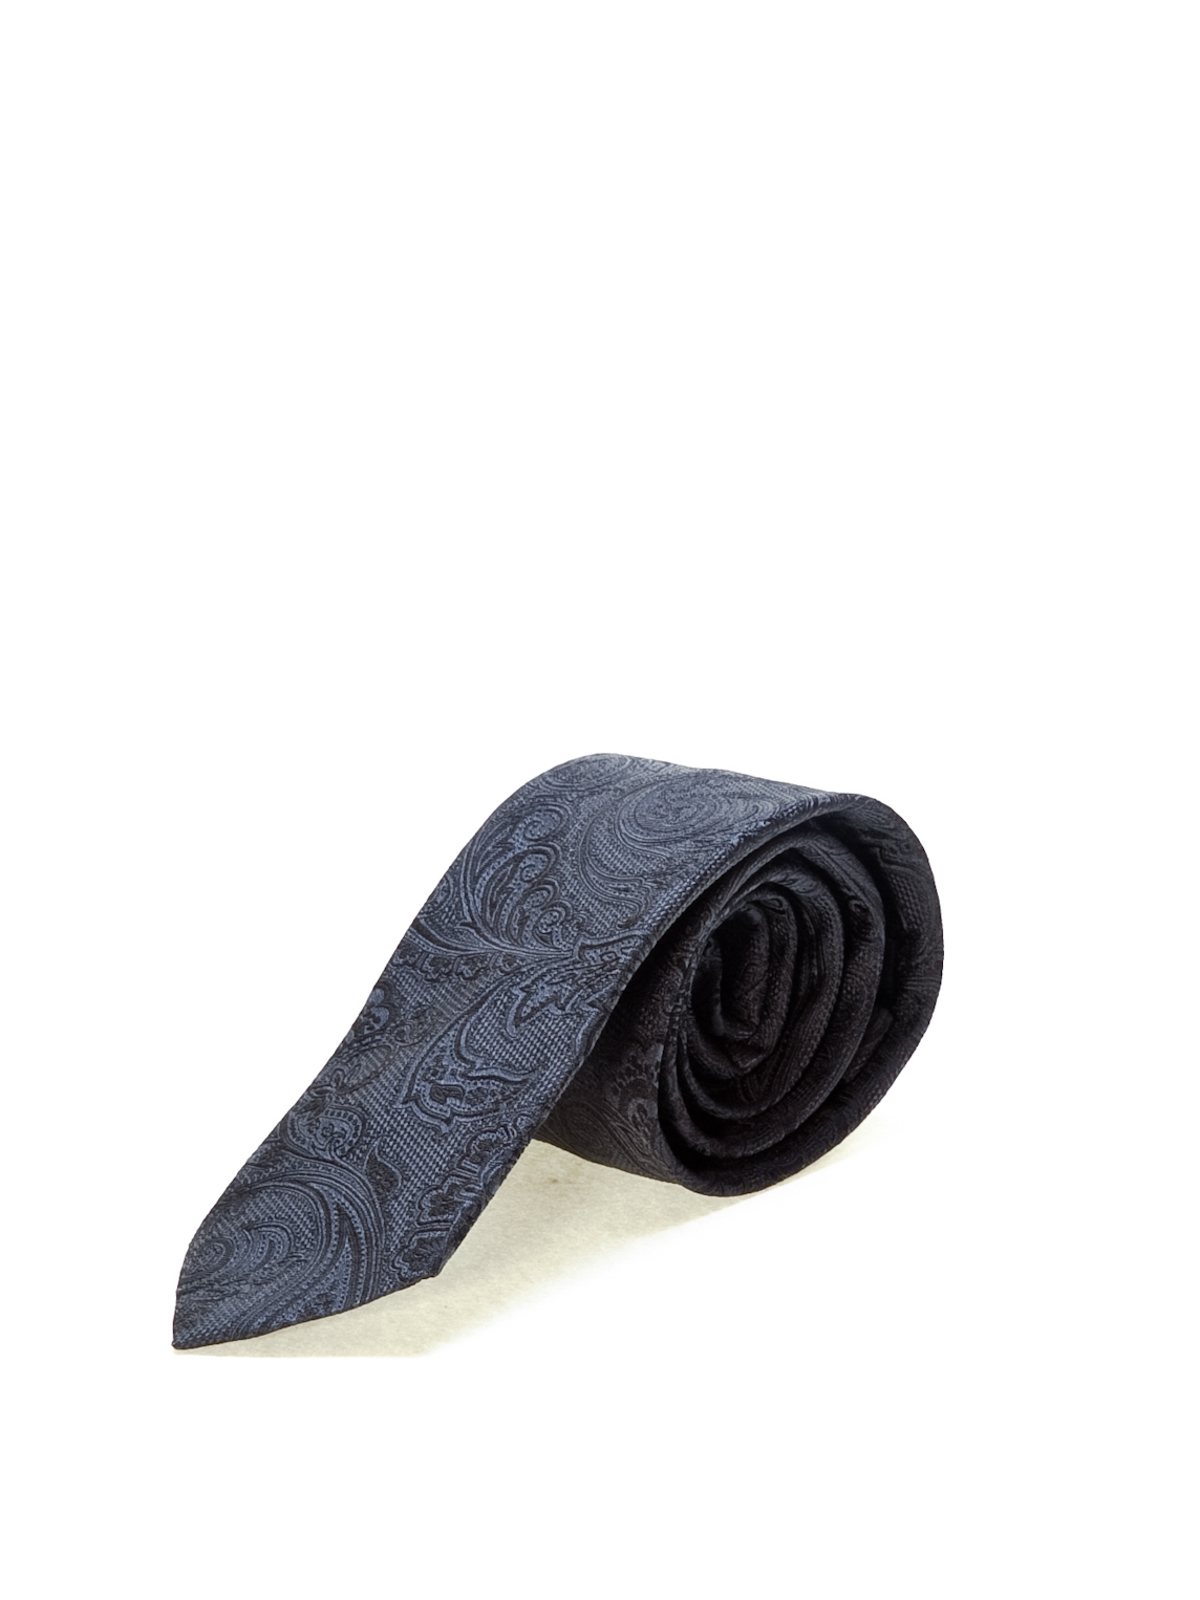 67b8b2f75c4c Dolce & Gabbana - Fantasy pattern silk tie - ties & bow ties ...